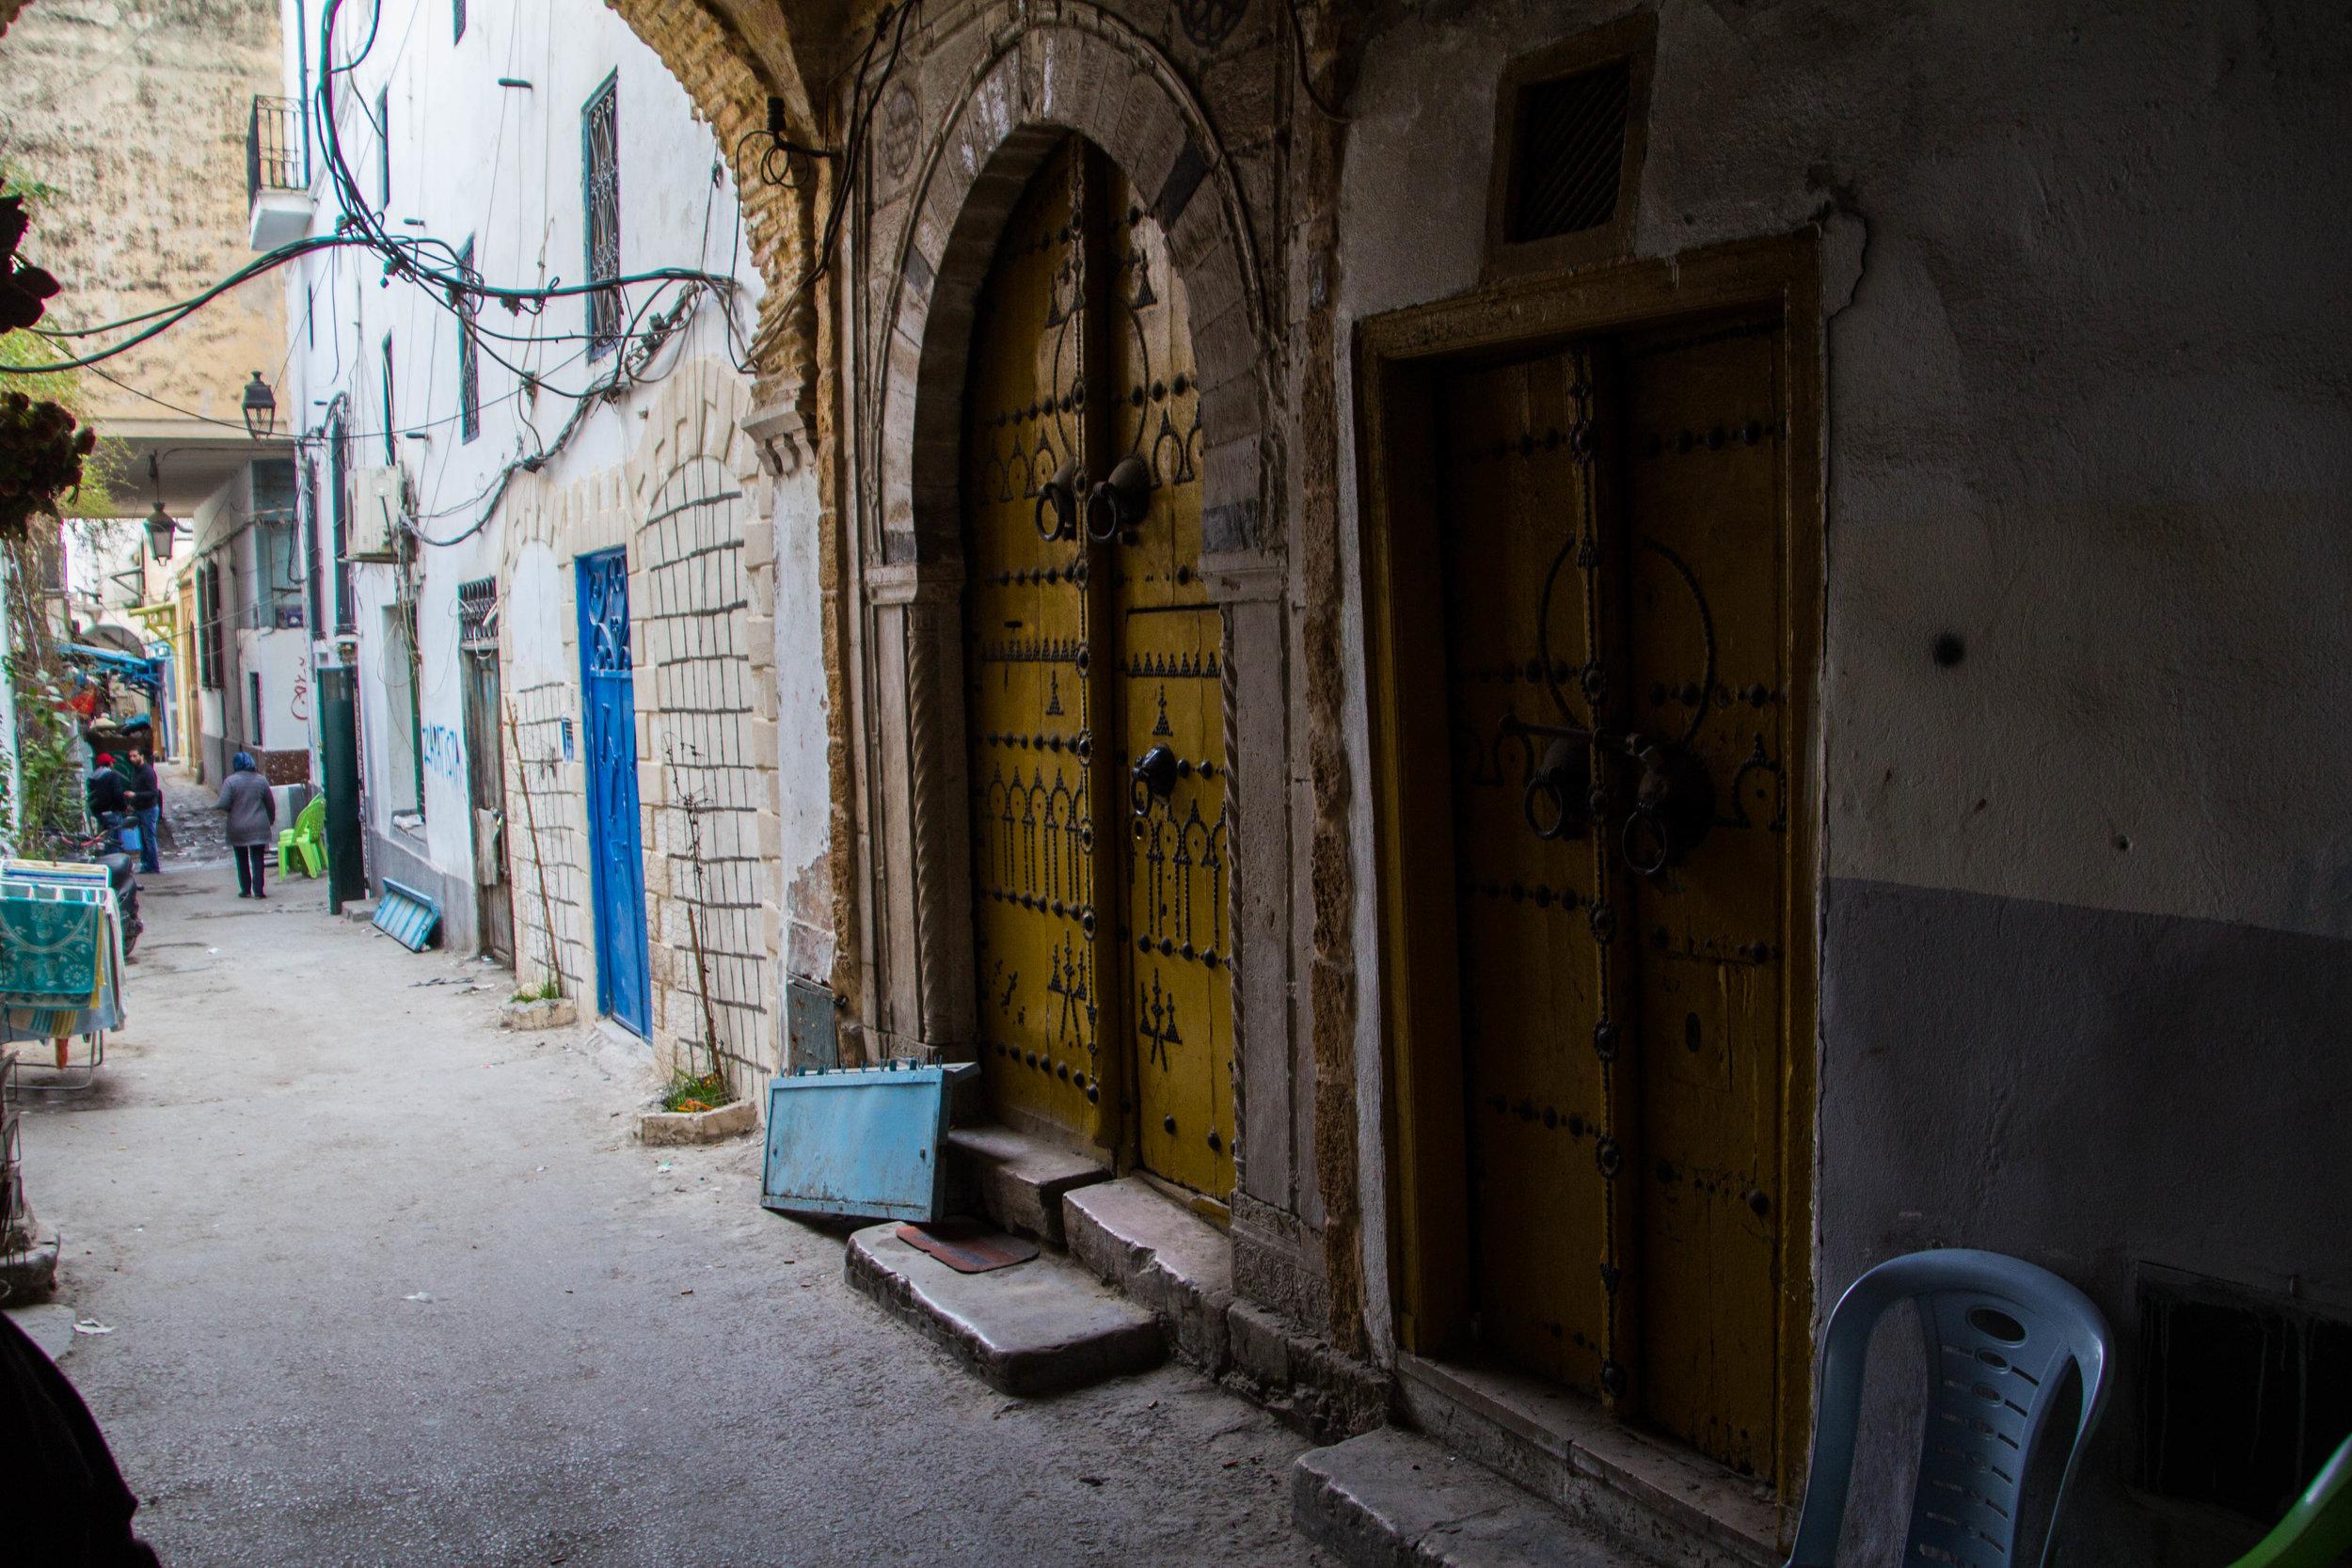 medina-photography-tunis-tunisia-16.jpg